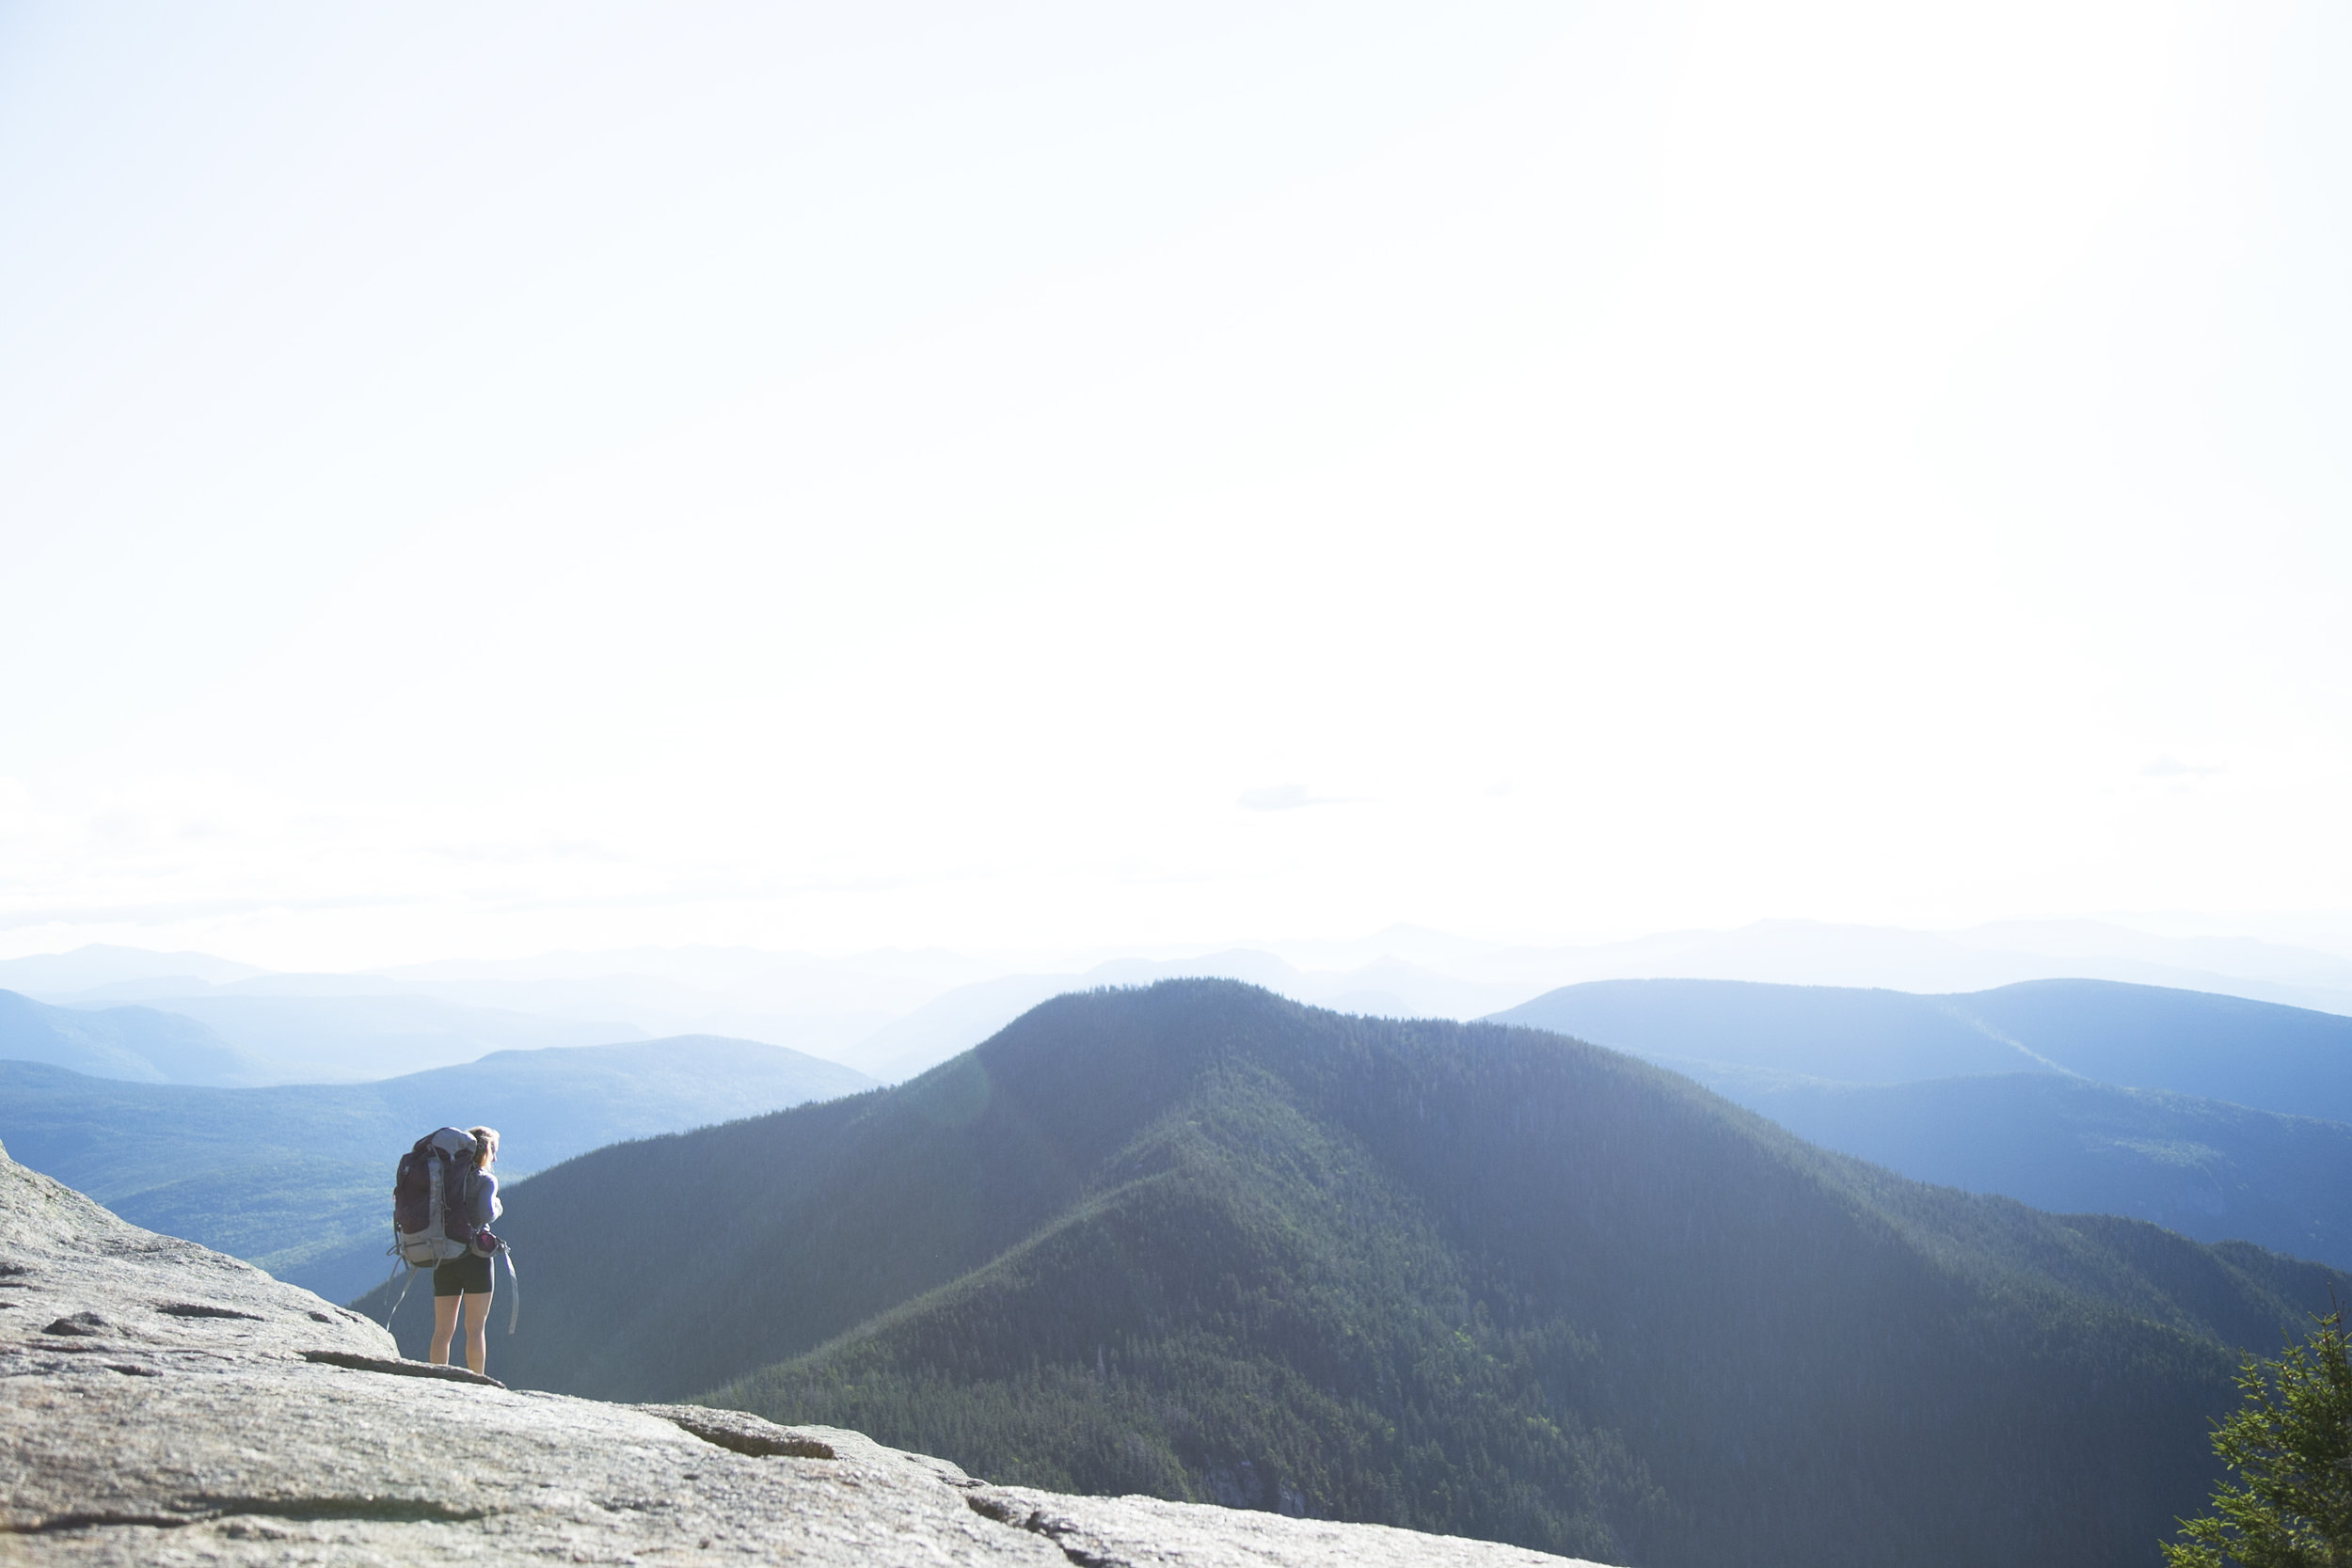 Summit of Mt. Osceola